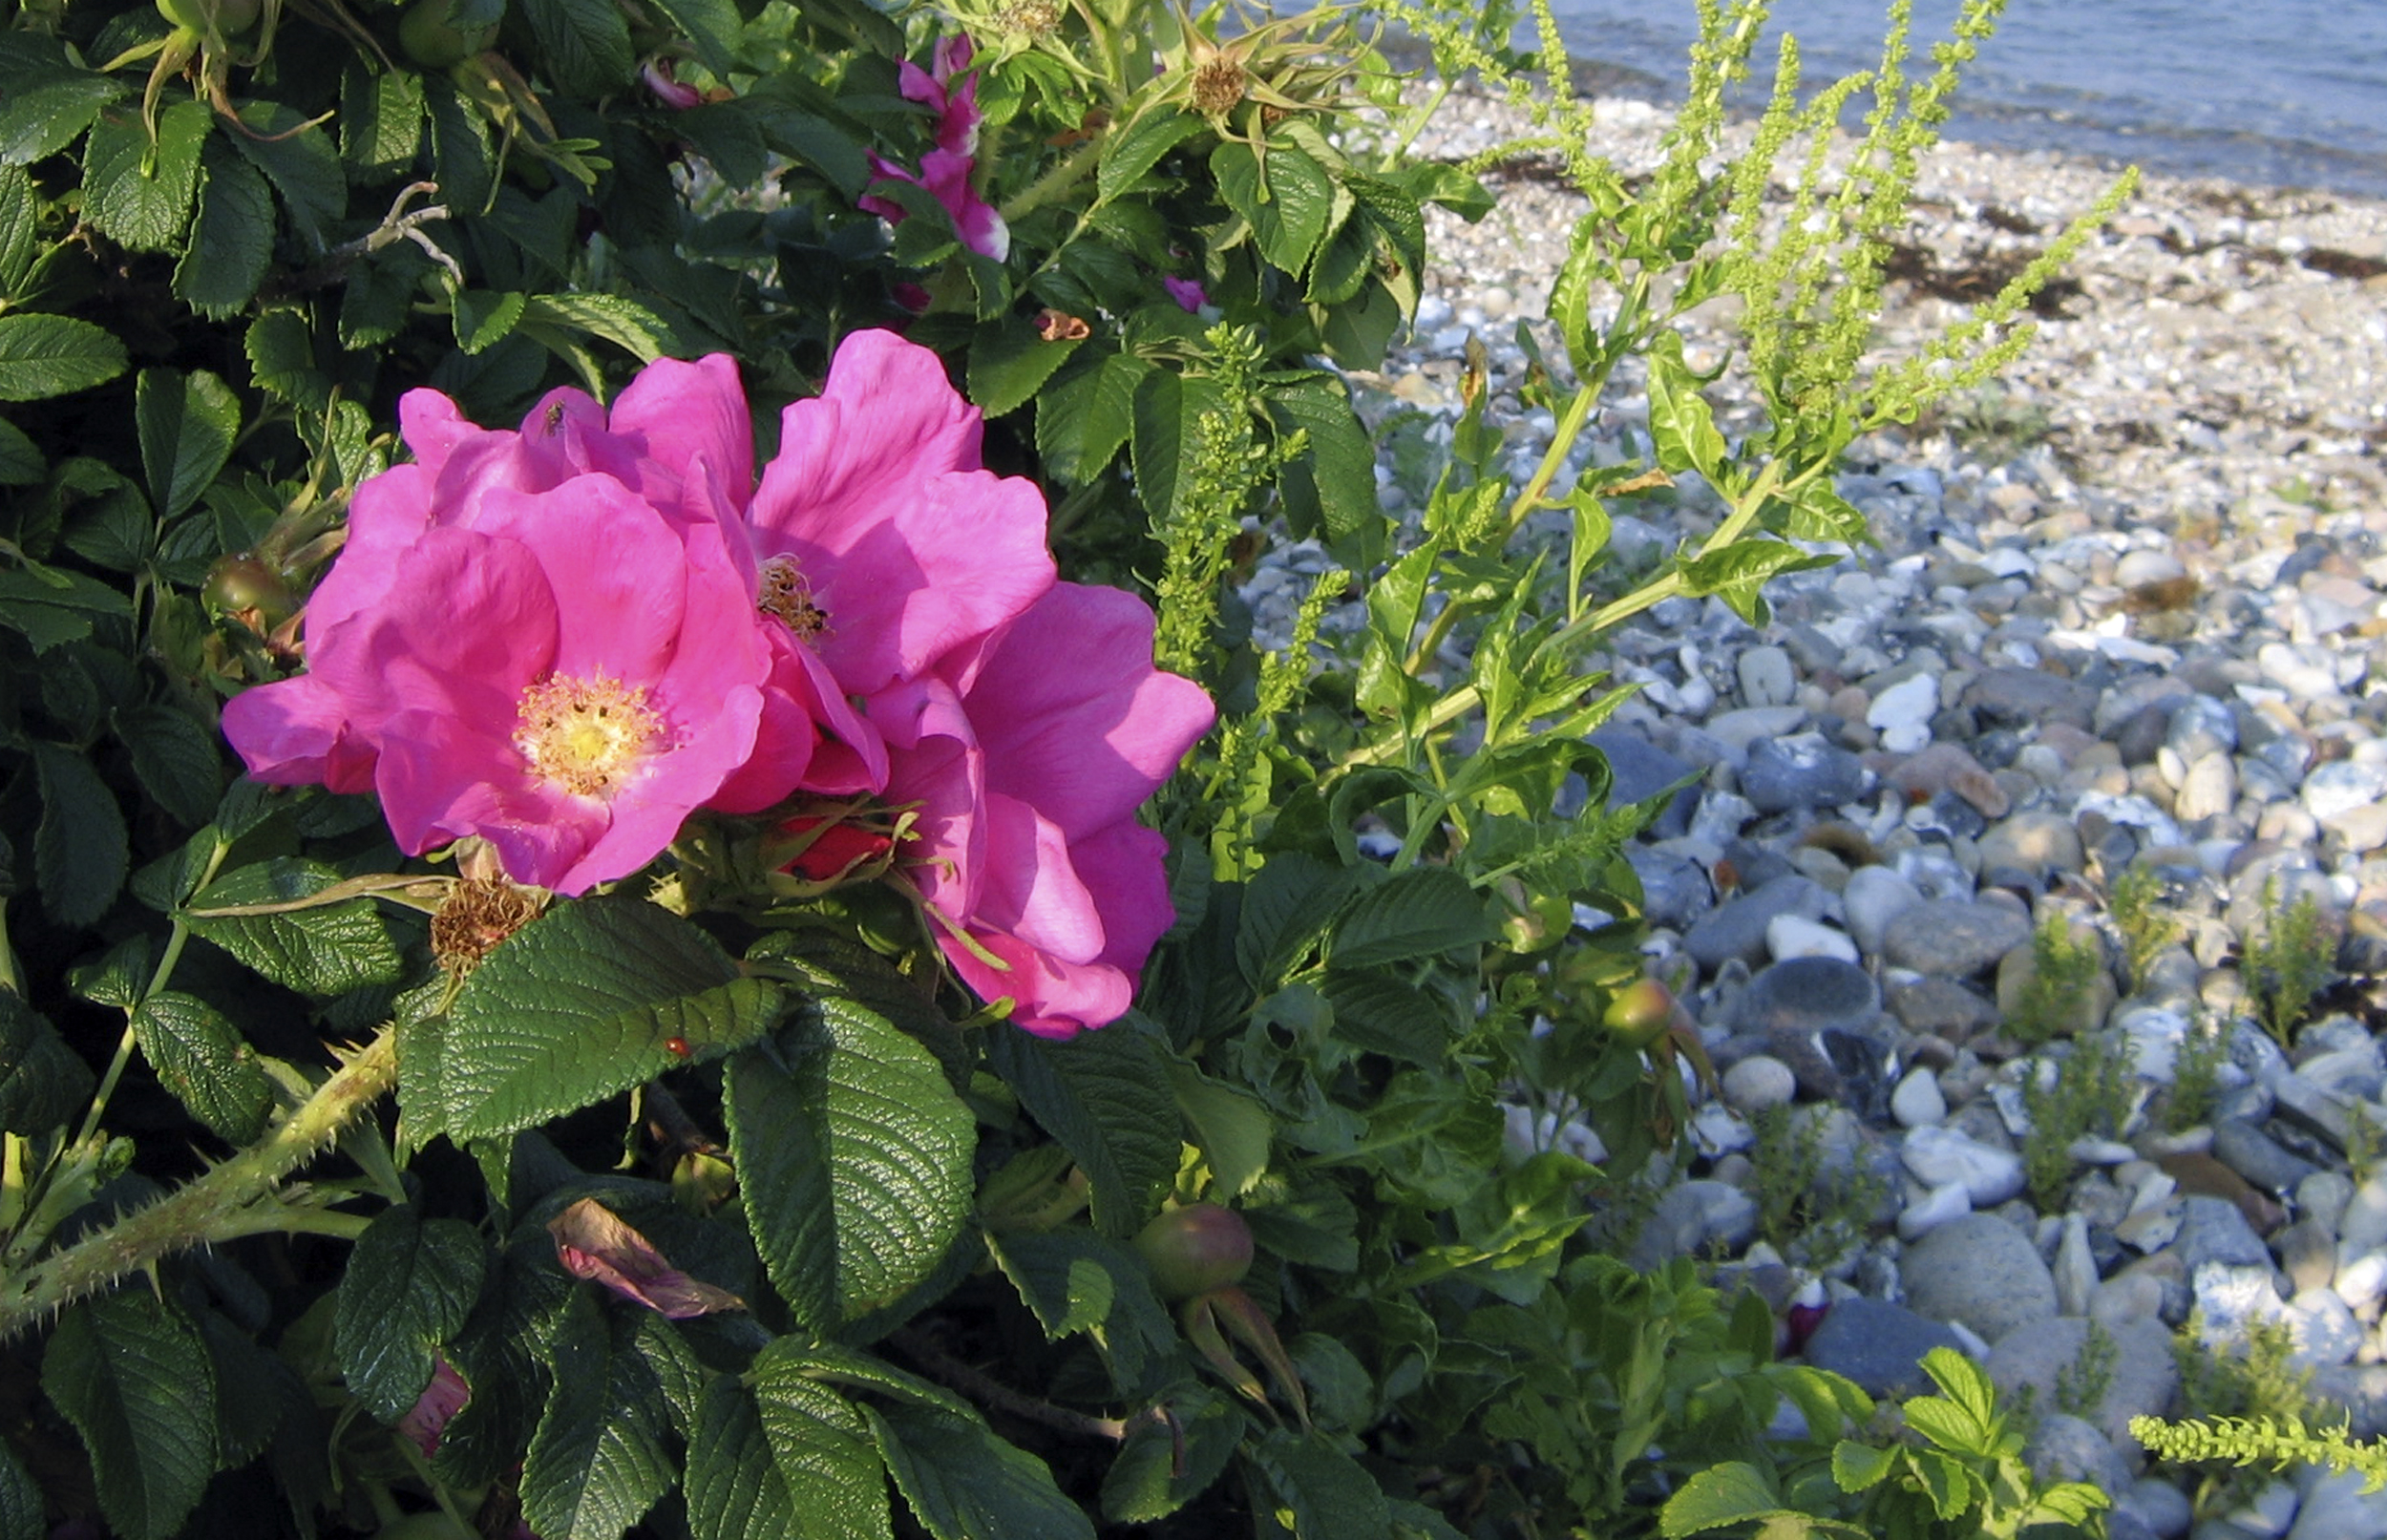 Lav rosensaft af hybenrosen